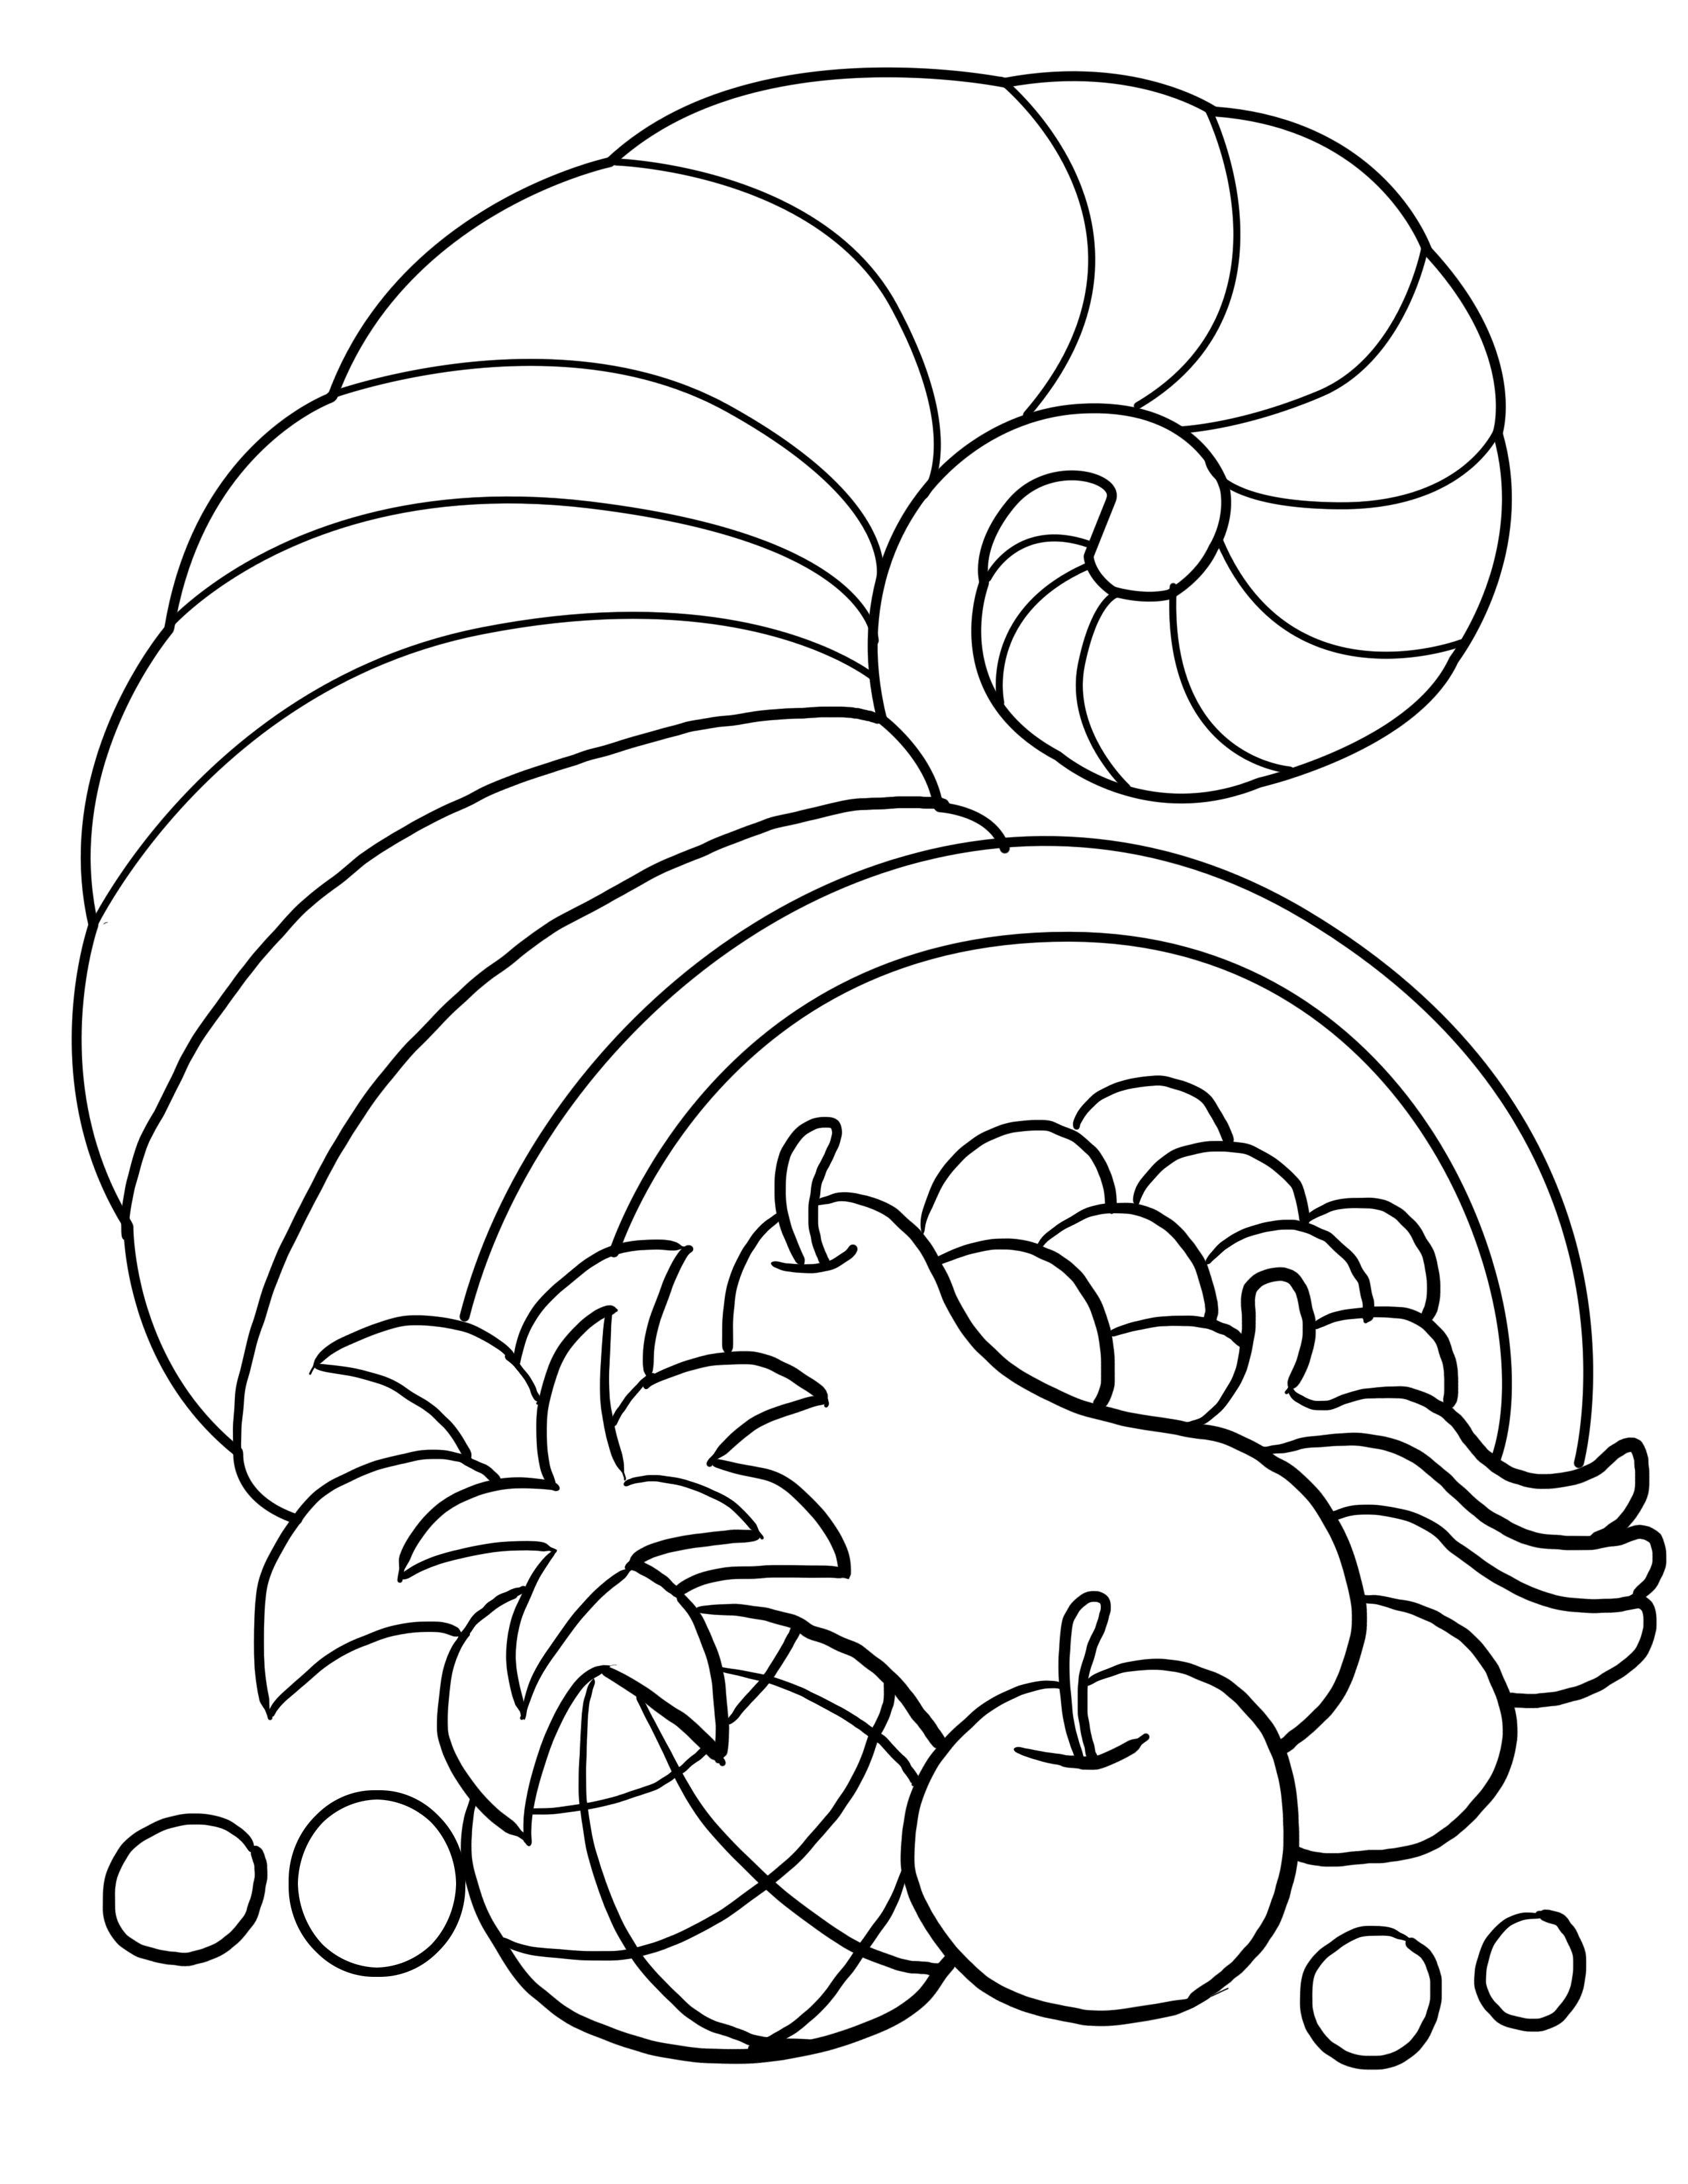 Thanksgiving Cornucopia Coloring Page Thanksgiving Pinterest